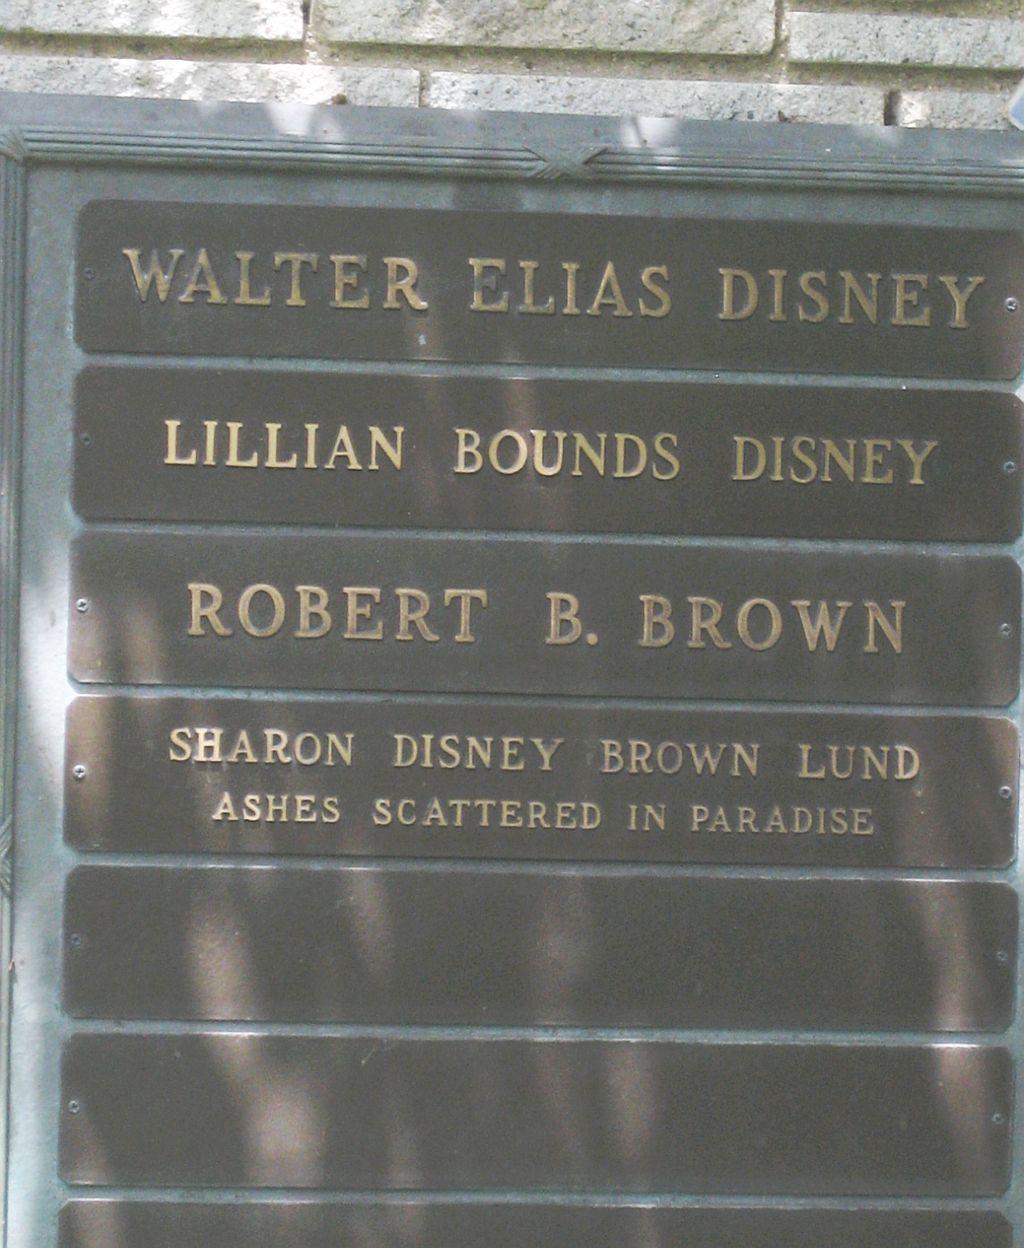 walt-disney-grave-marker-2013.jpg